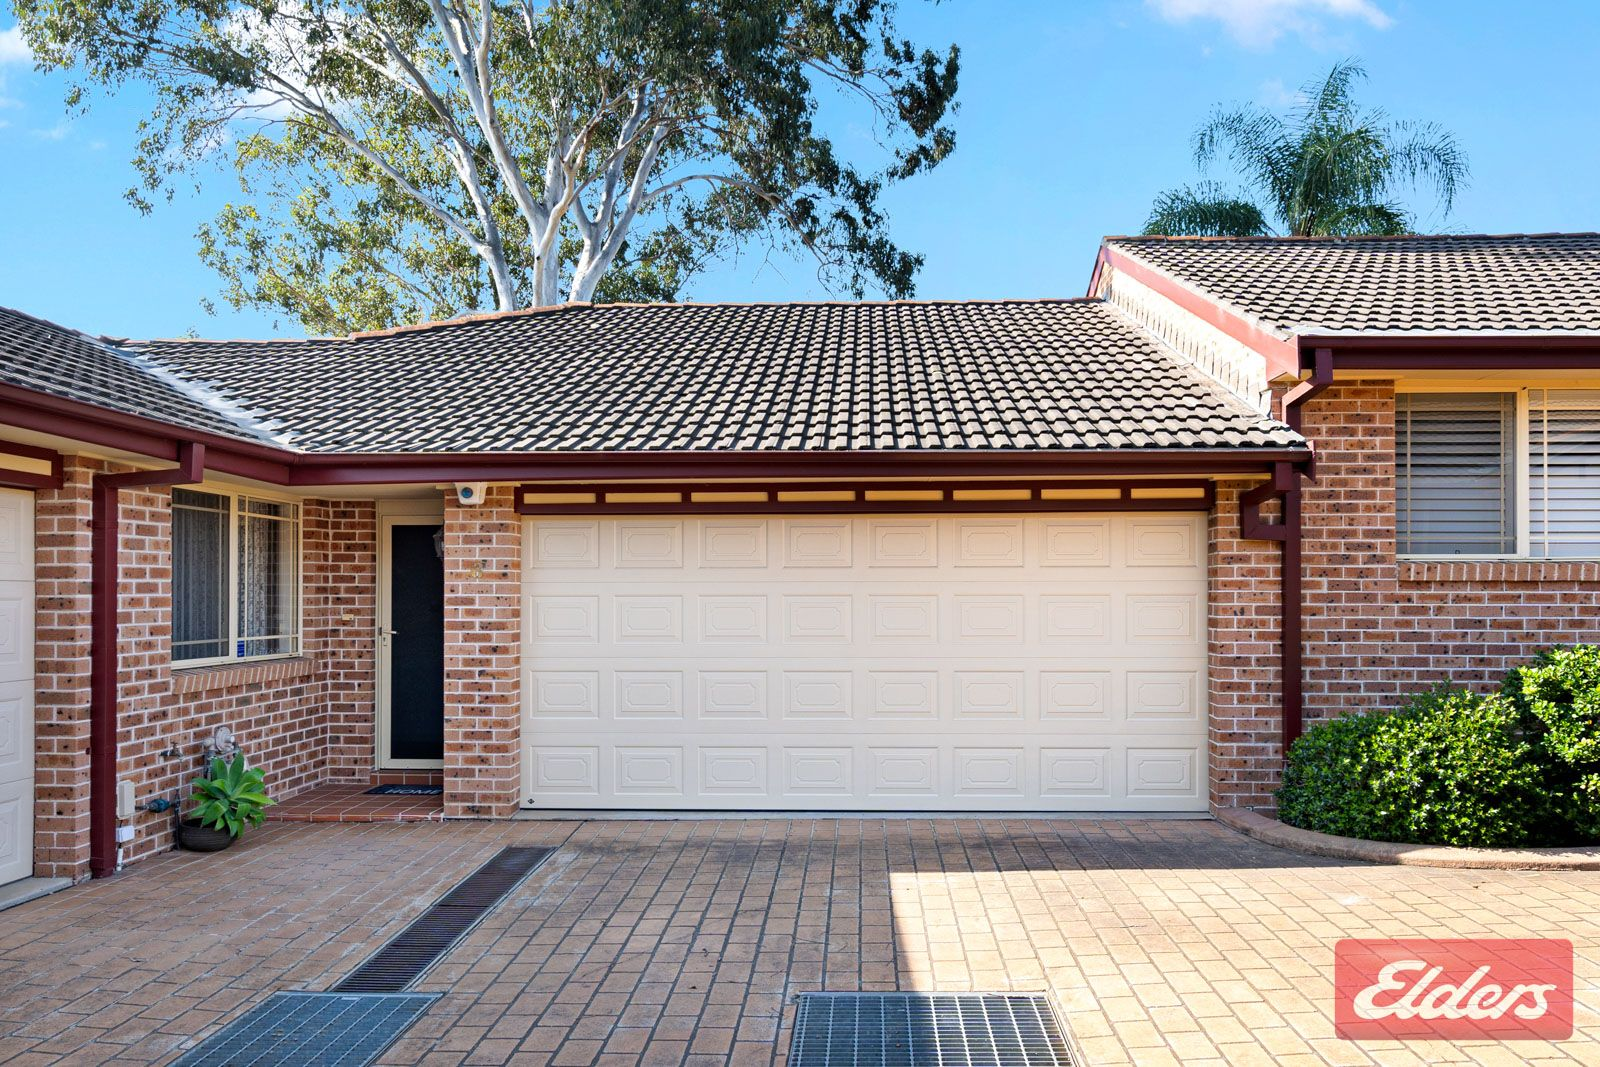 6/88 Ballandella Road, Toongabbie NSW 2146, Image 1